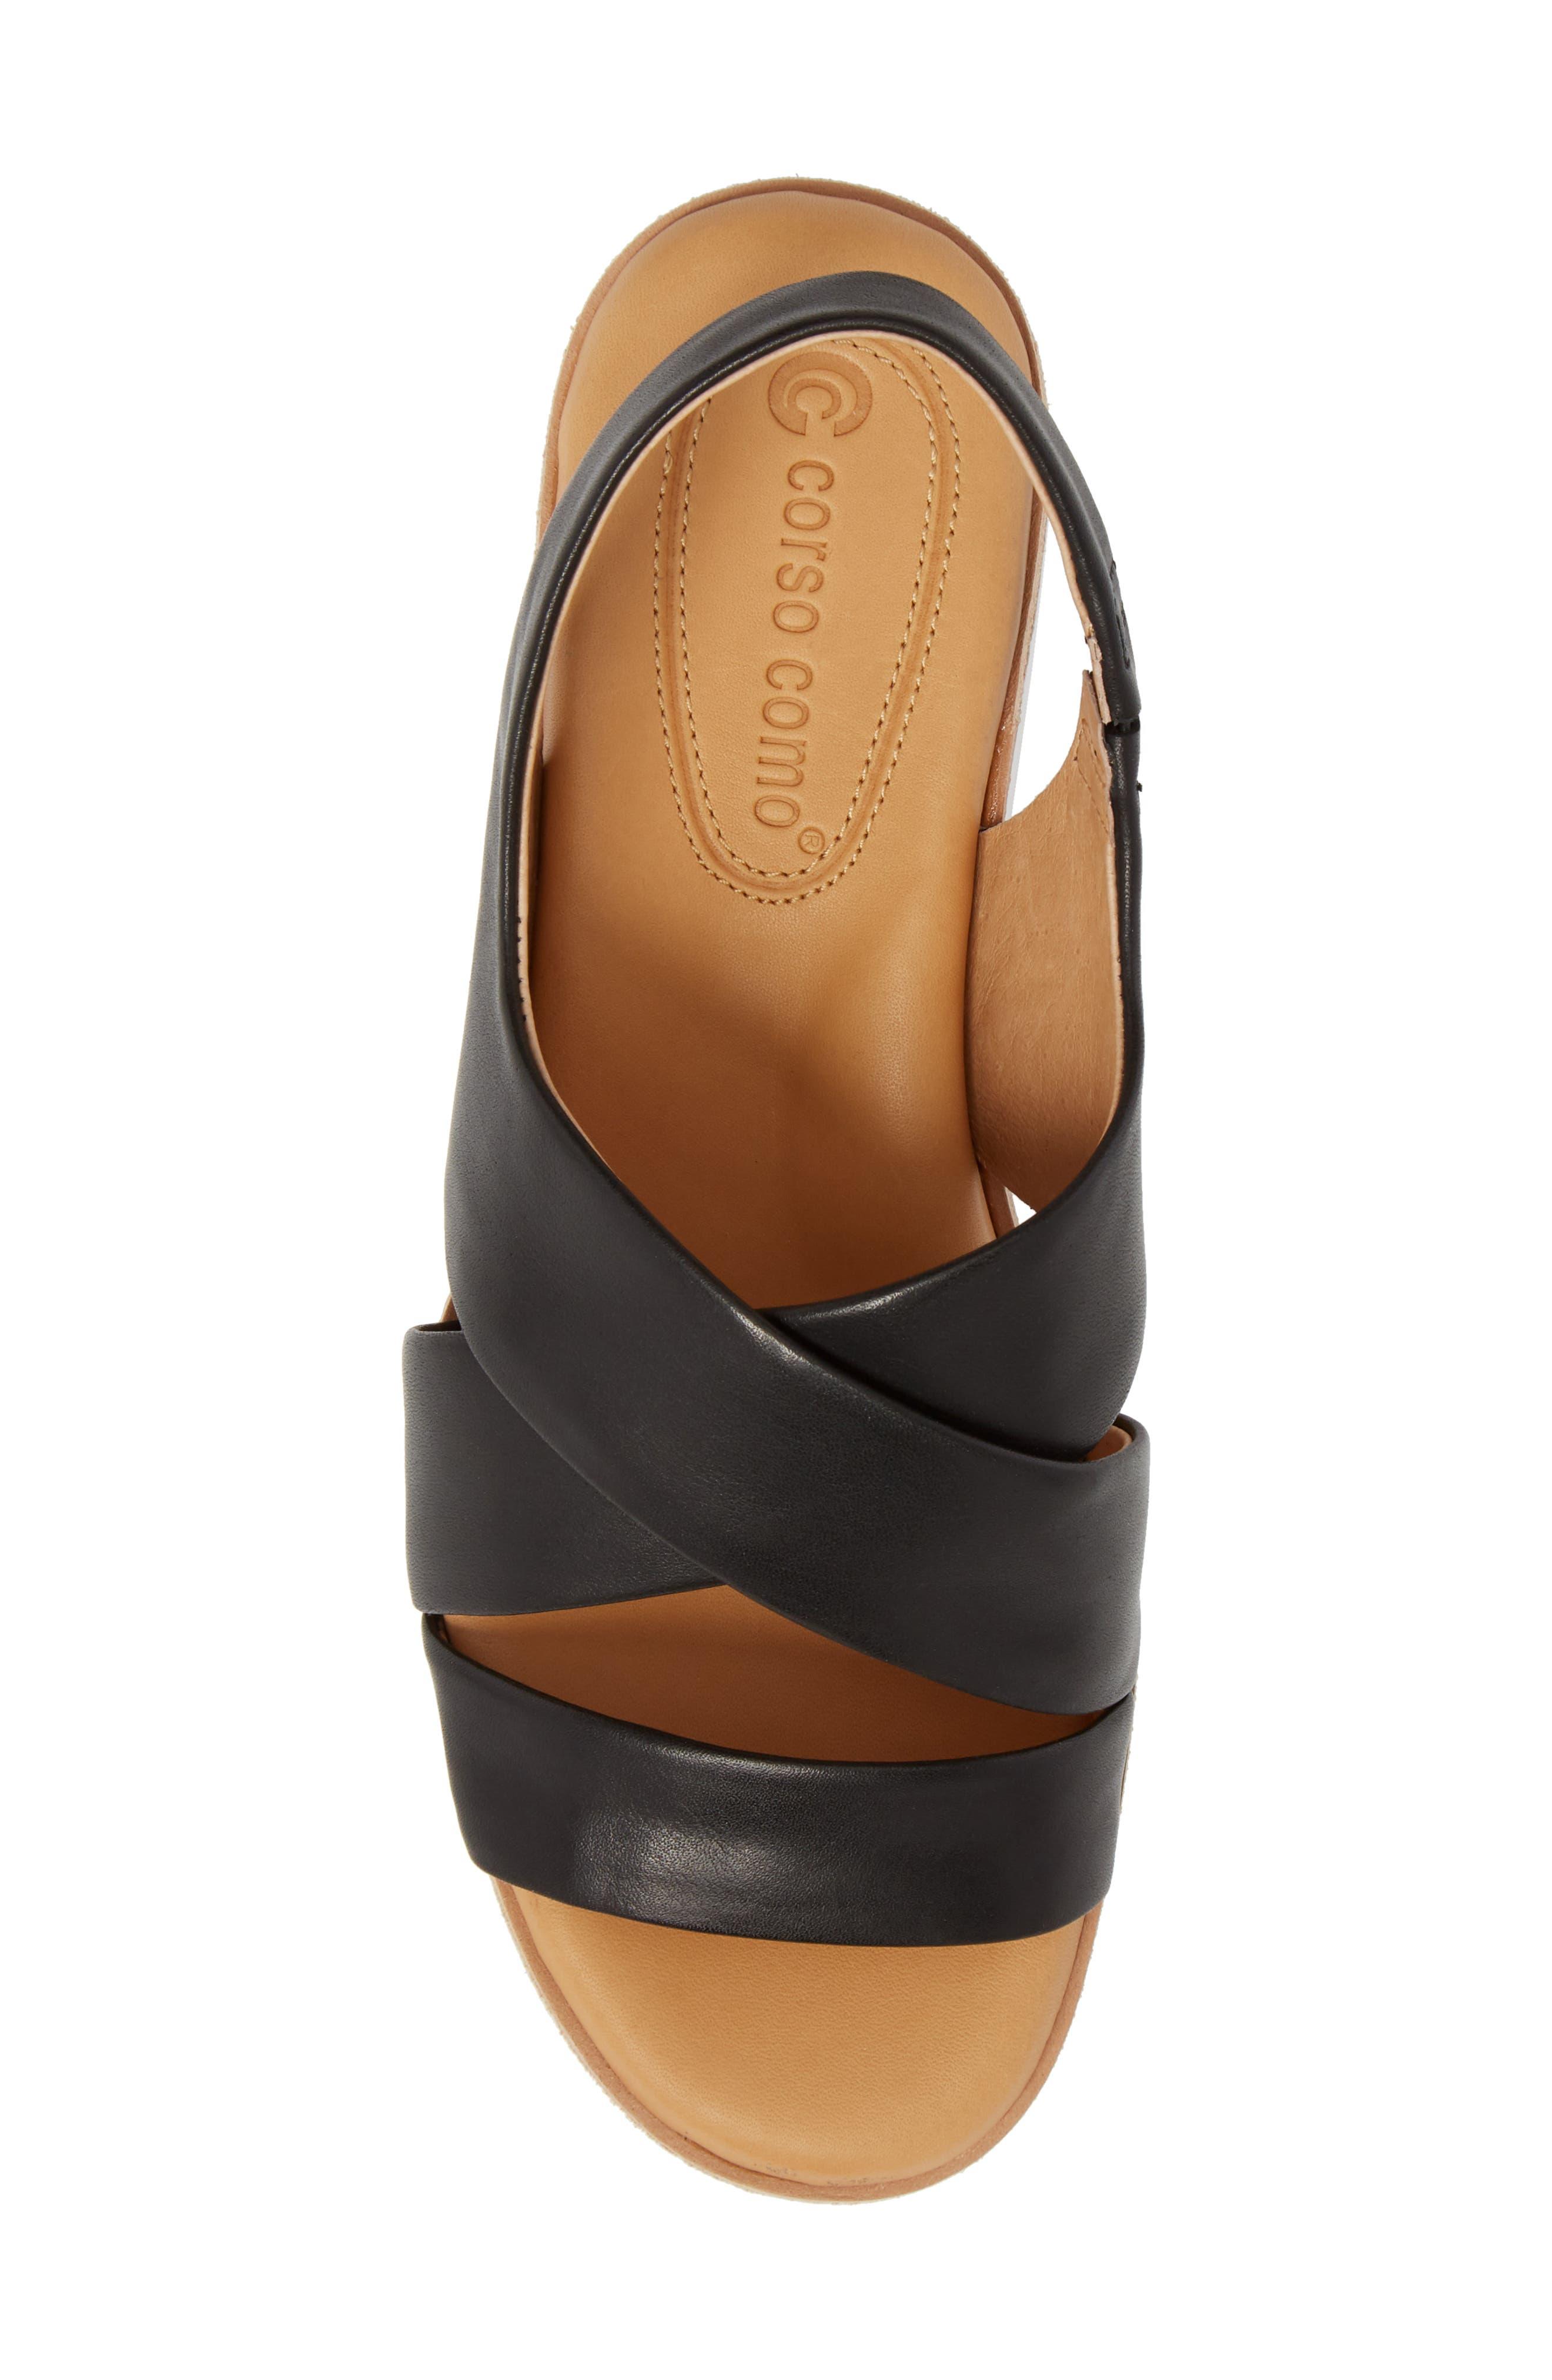 Brinney Wedge Sandal,                             Alternate thumbnail 5, color,                             BLACK LEATHER